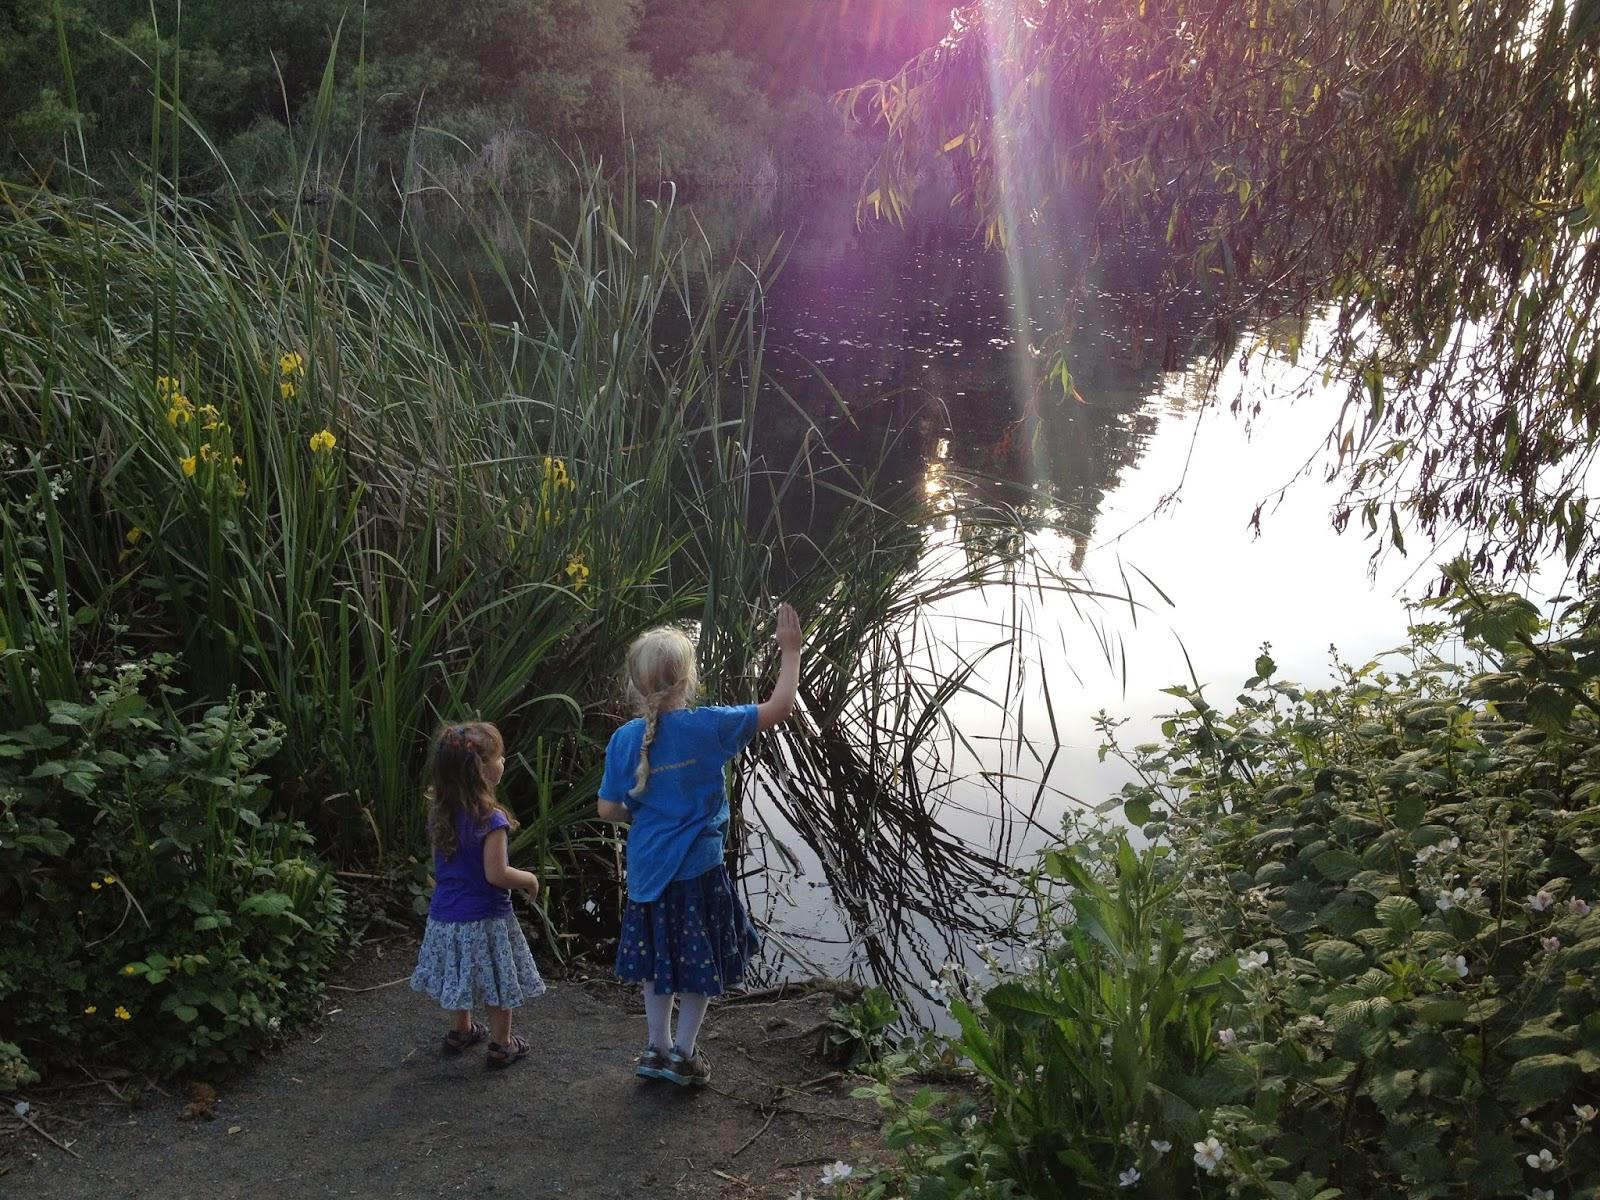 Lakeside by Lake Temescal, Temescal Regional Recreation Area by Rachel Medanic